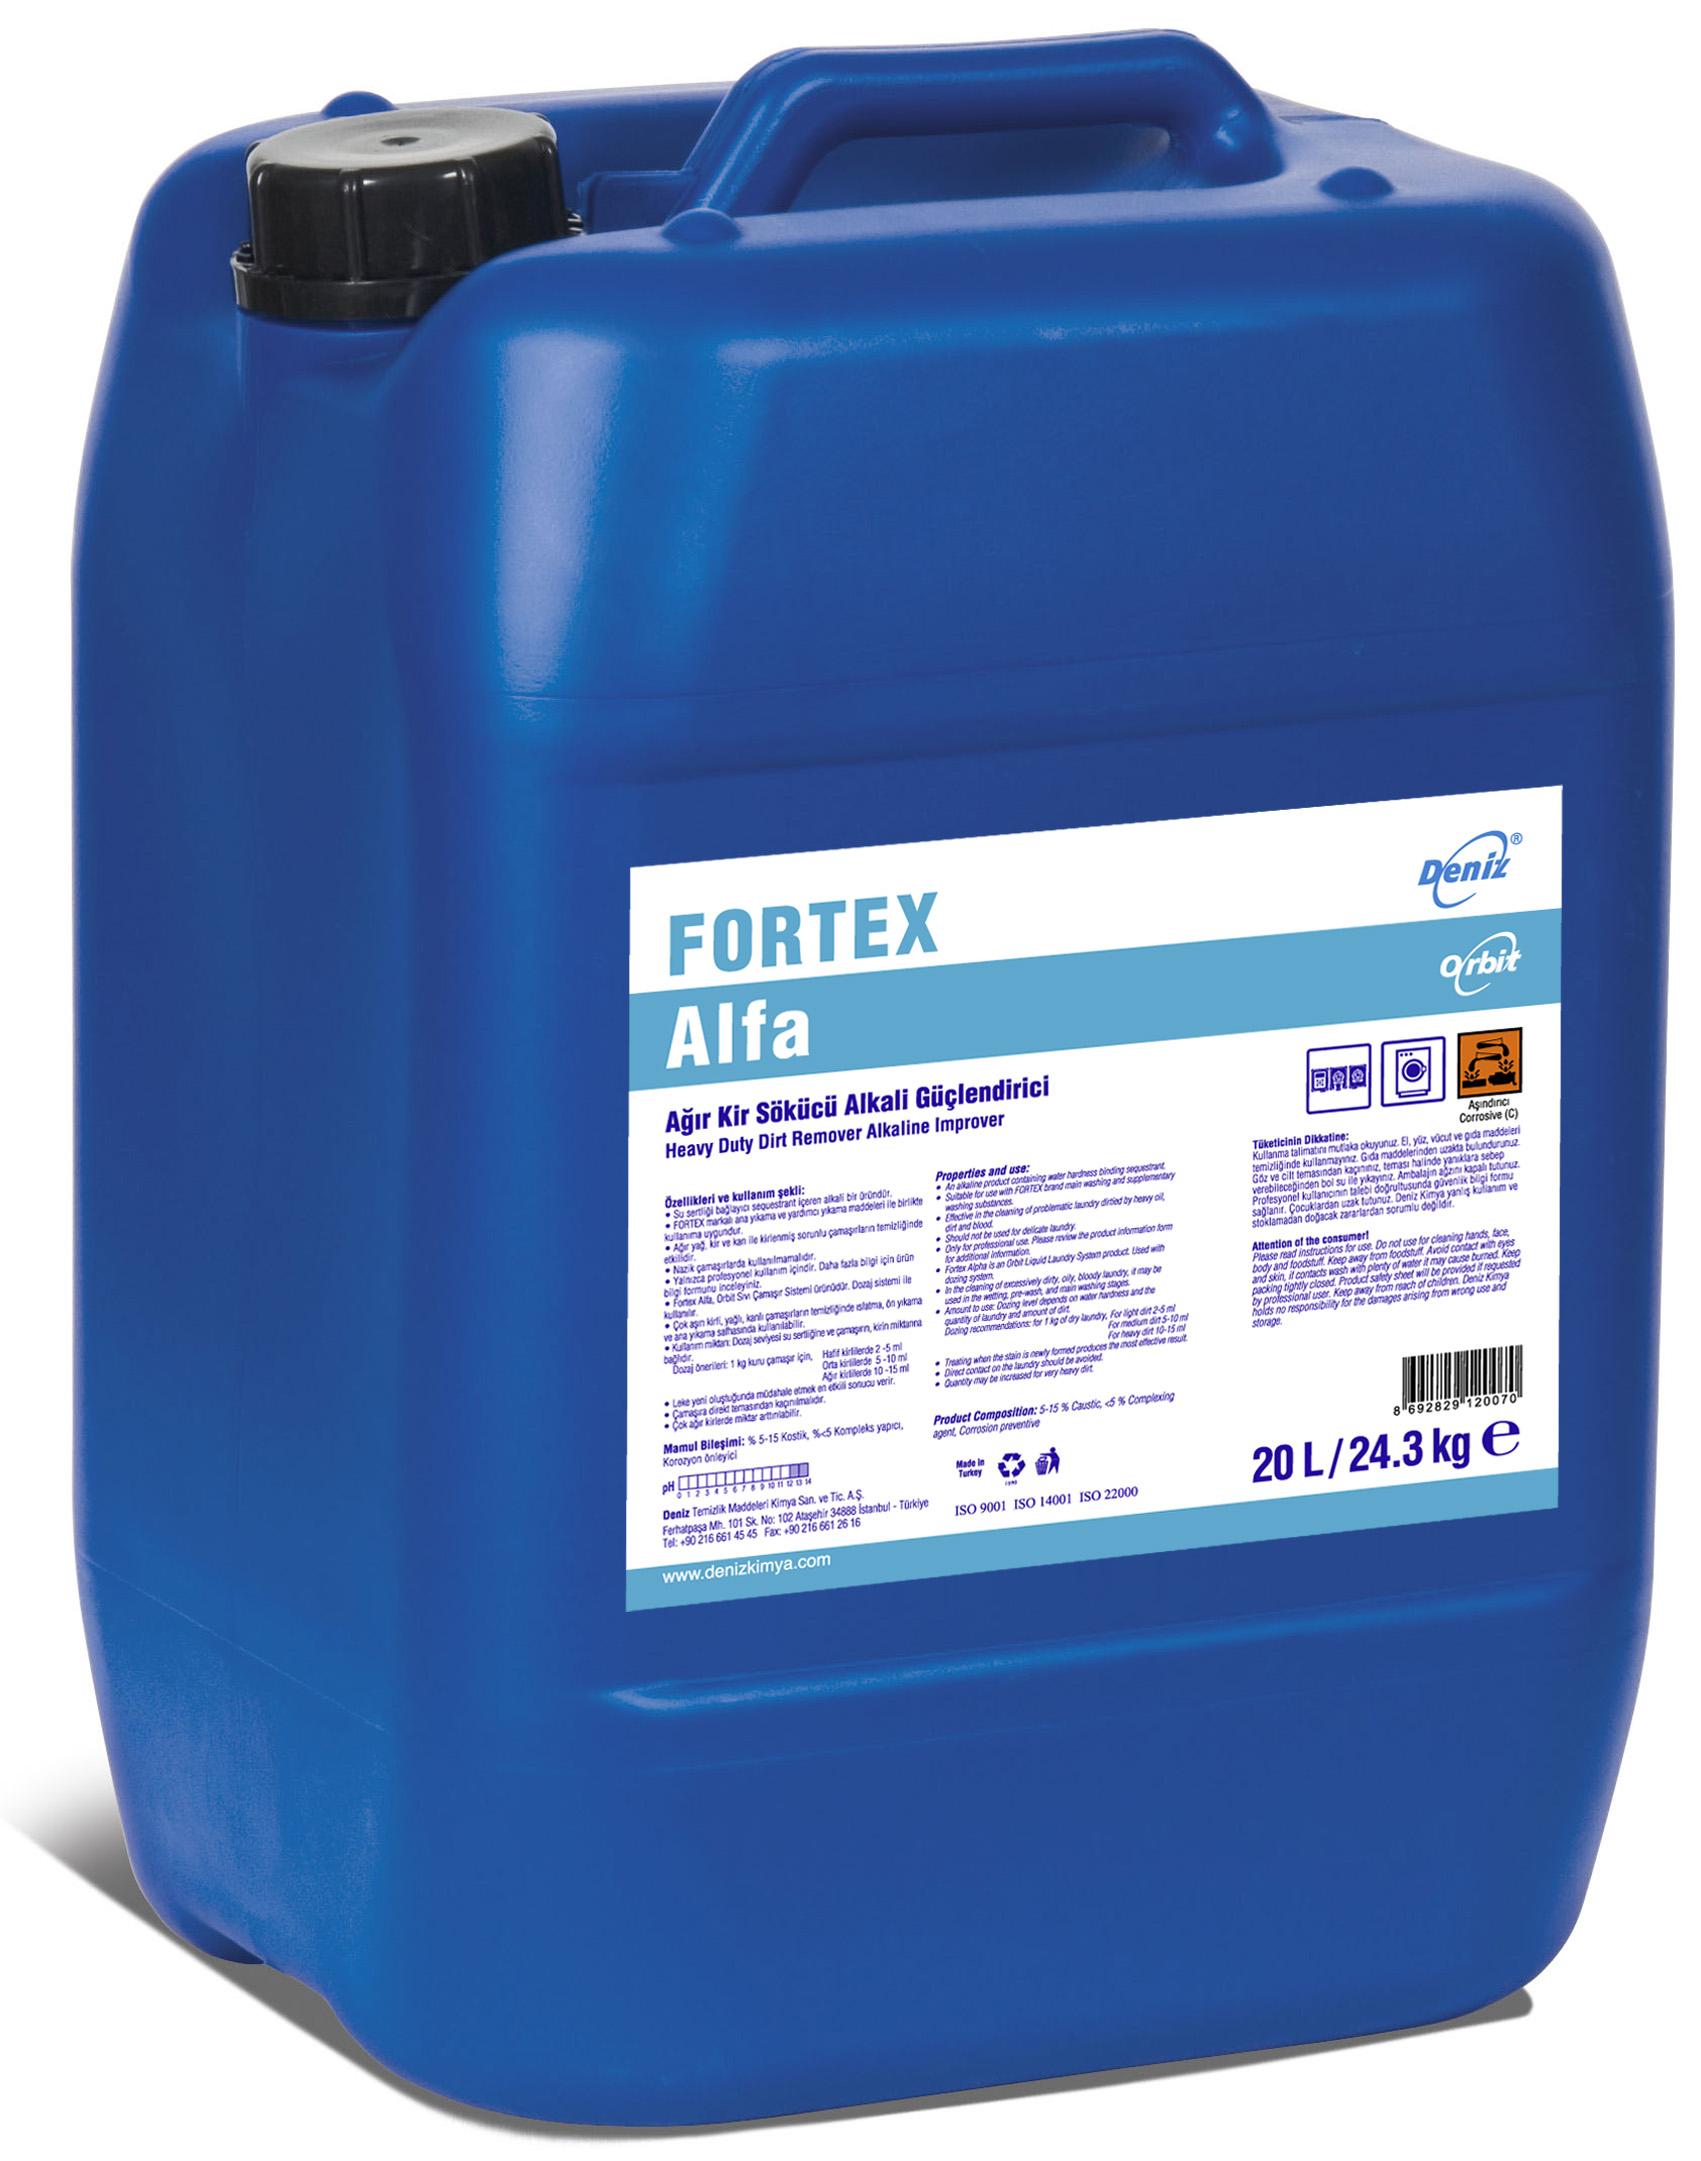 Fortex ALFA